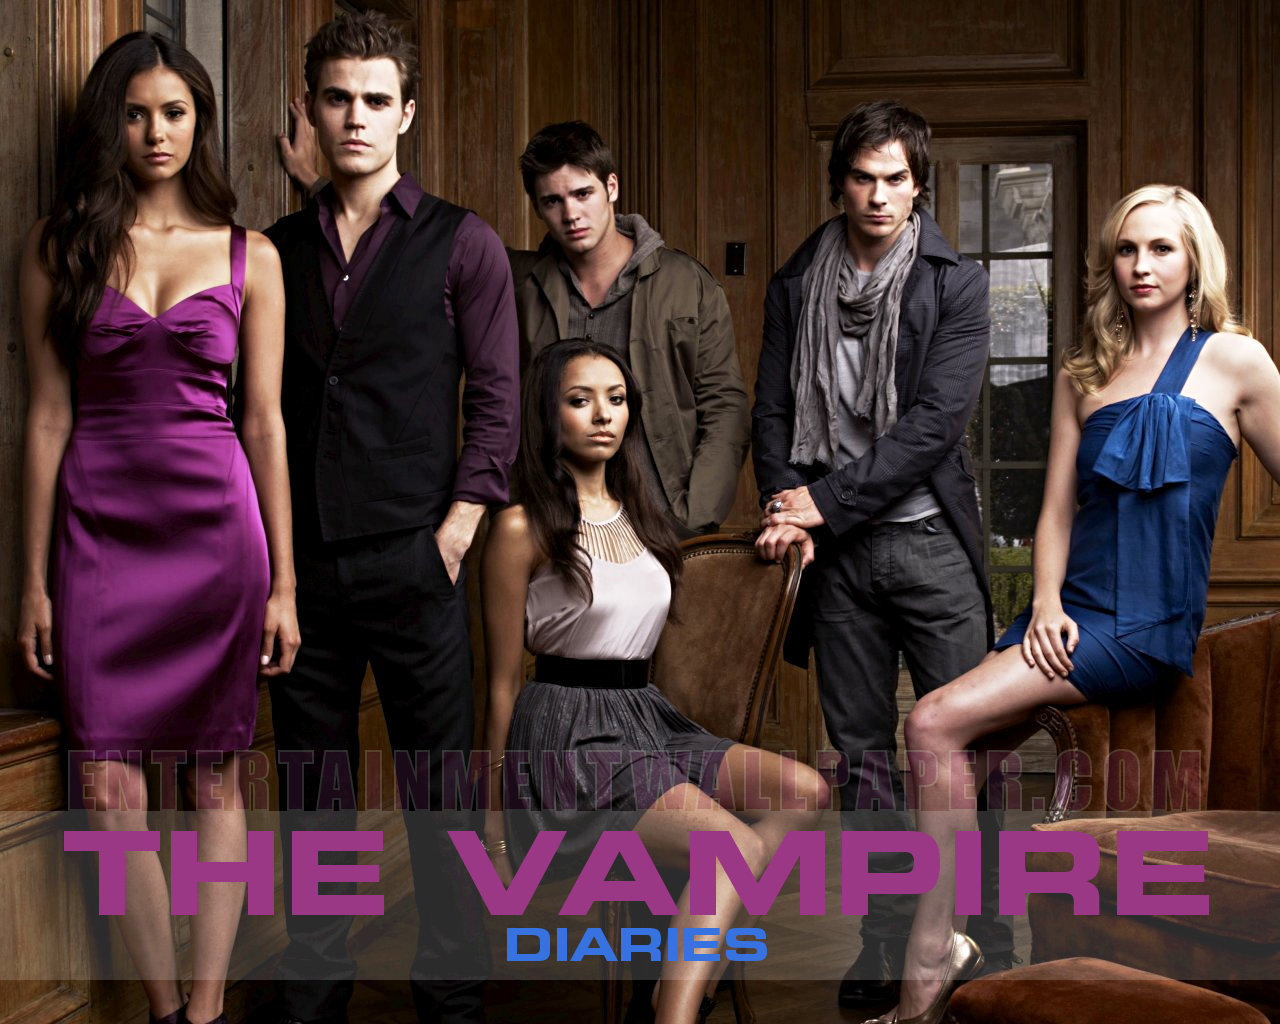 http://4.bp.blogspot.com/-jrdc1oZ0uao/T8g_1j9L1zI/AAAAAAAAB4g/GiTSC_DCVDY/s1600/Vampire%2BDiaries%2Bcast.png